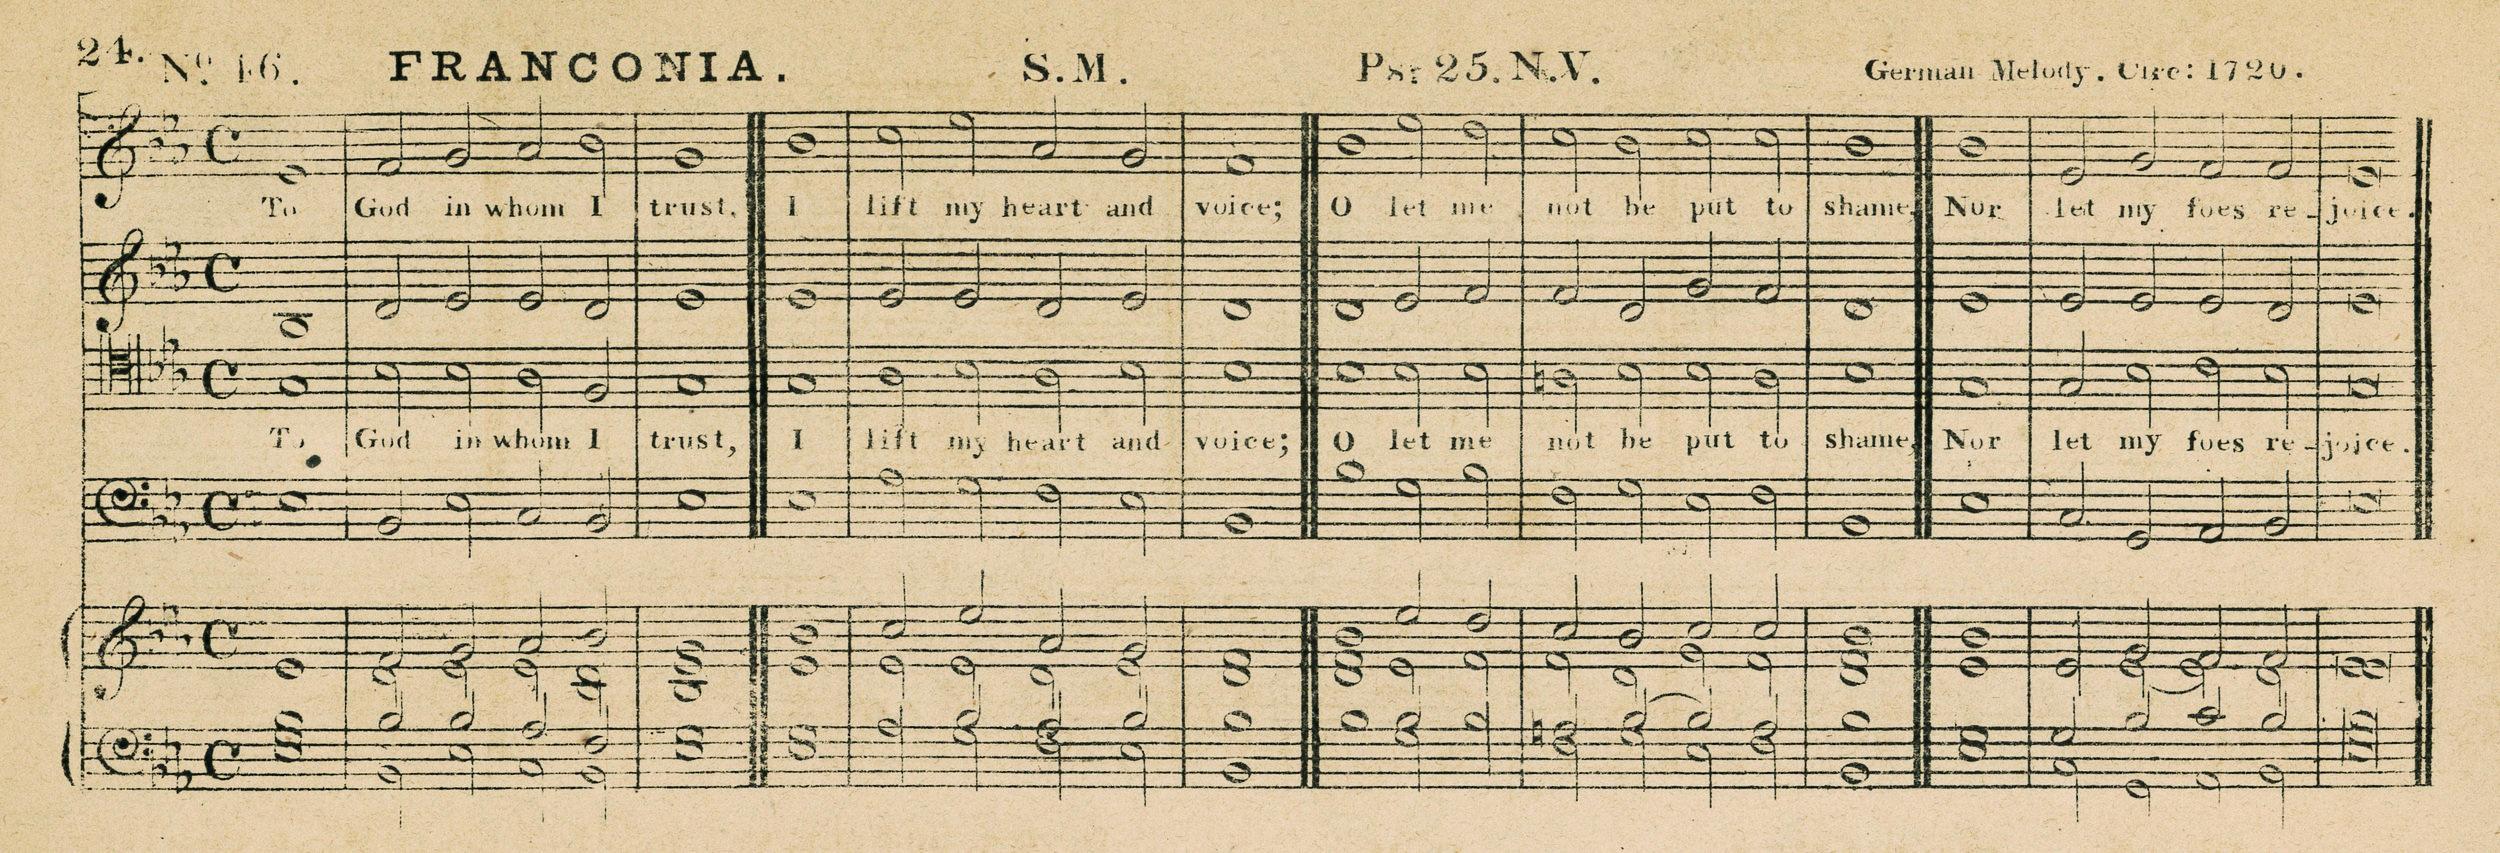 Fig. 4.  William Henry Havergal,  Old Church Psalmody , 3rd ed. (London: J. Shepherd, 1853).